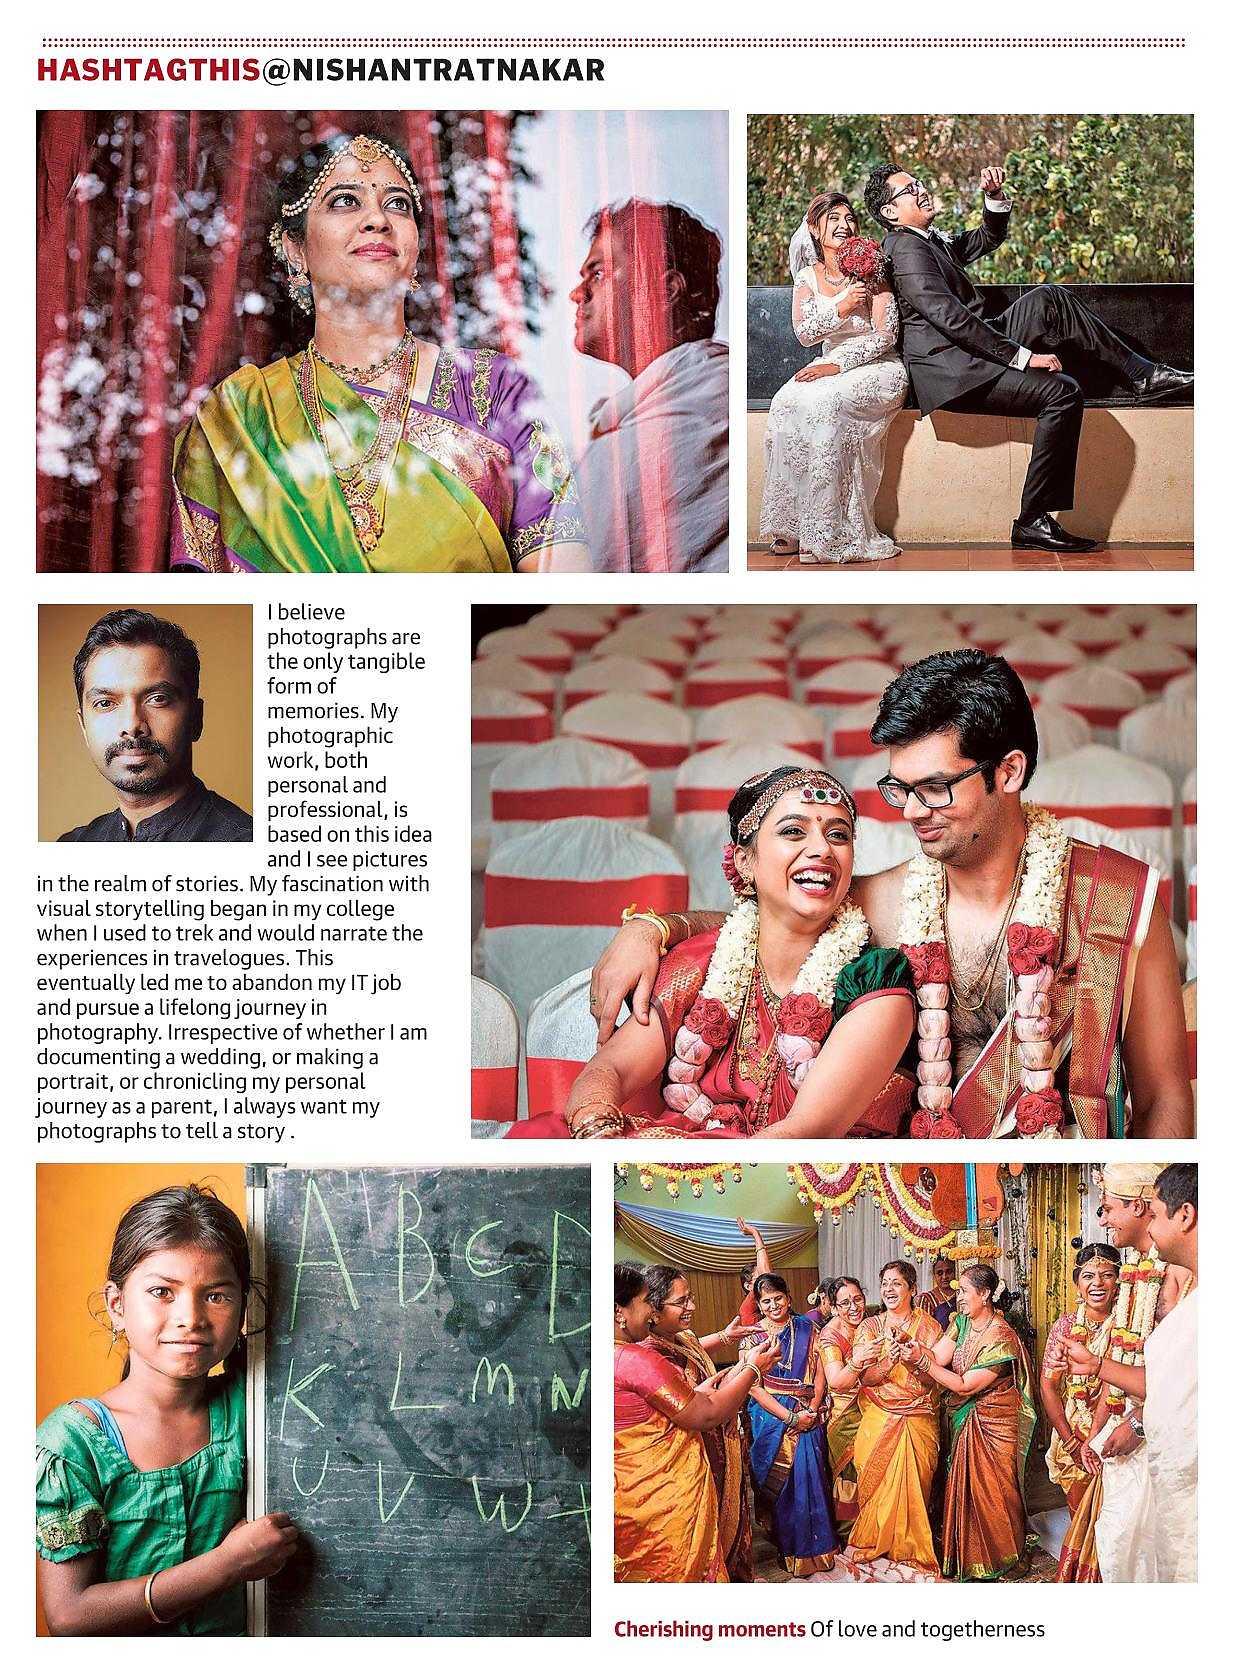 Featured in The Hindu | Nishant Ratnakar Photography